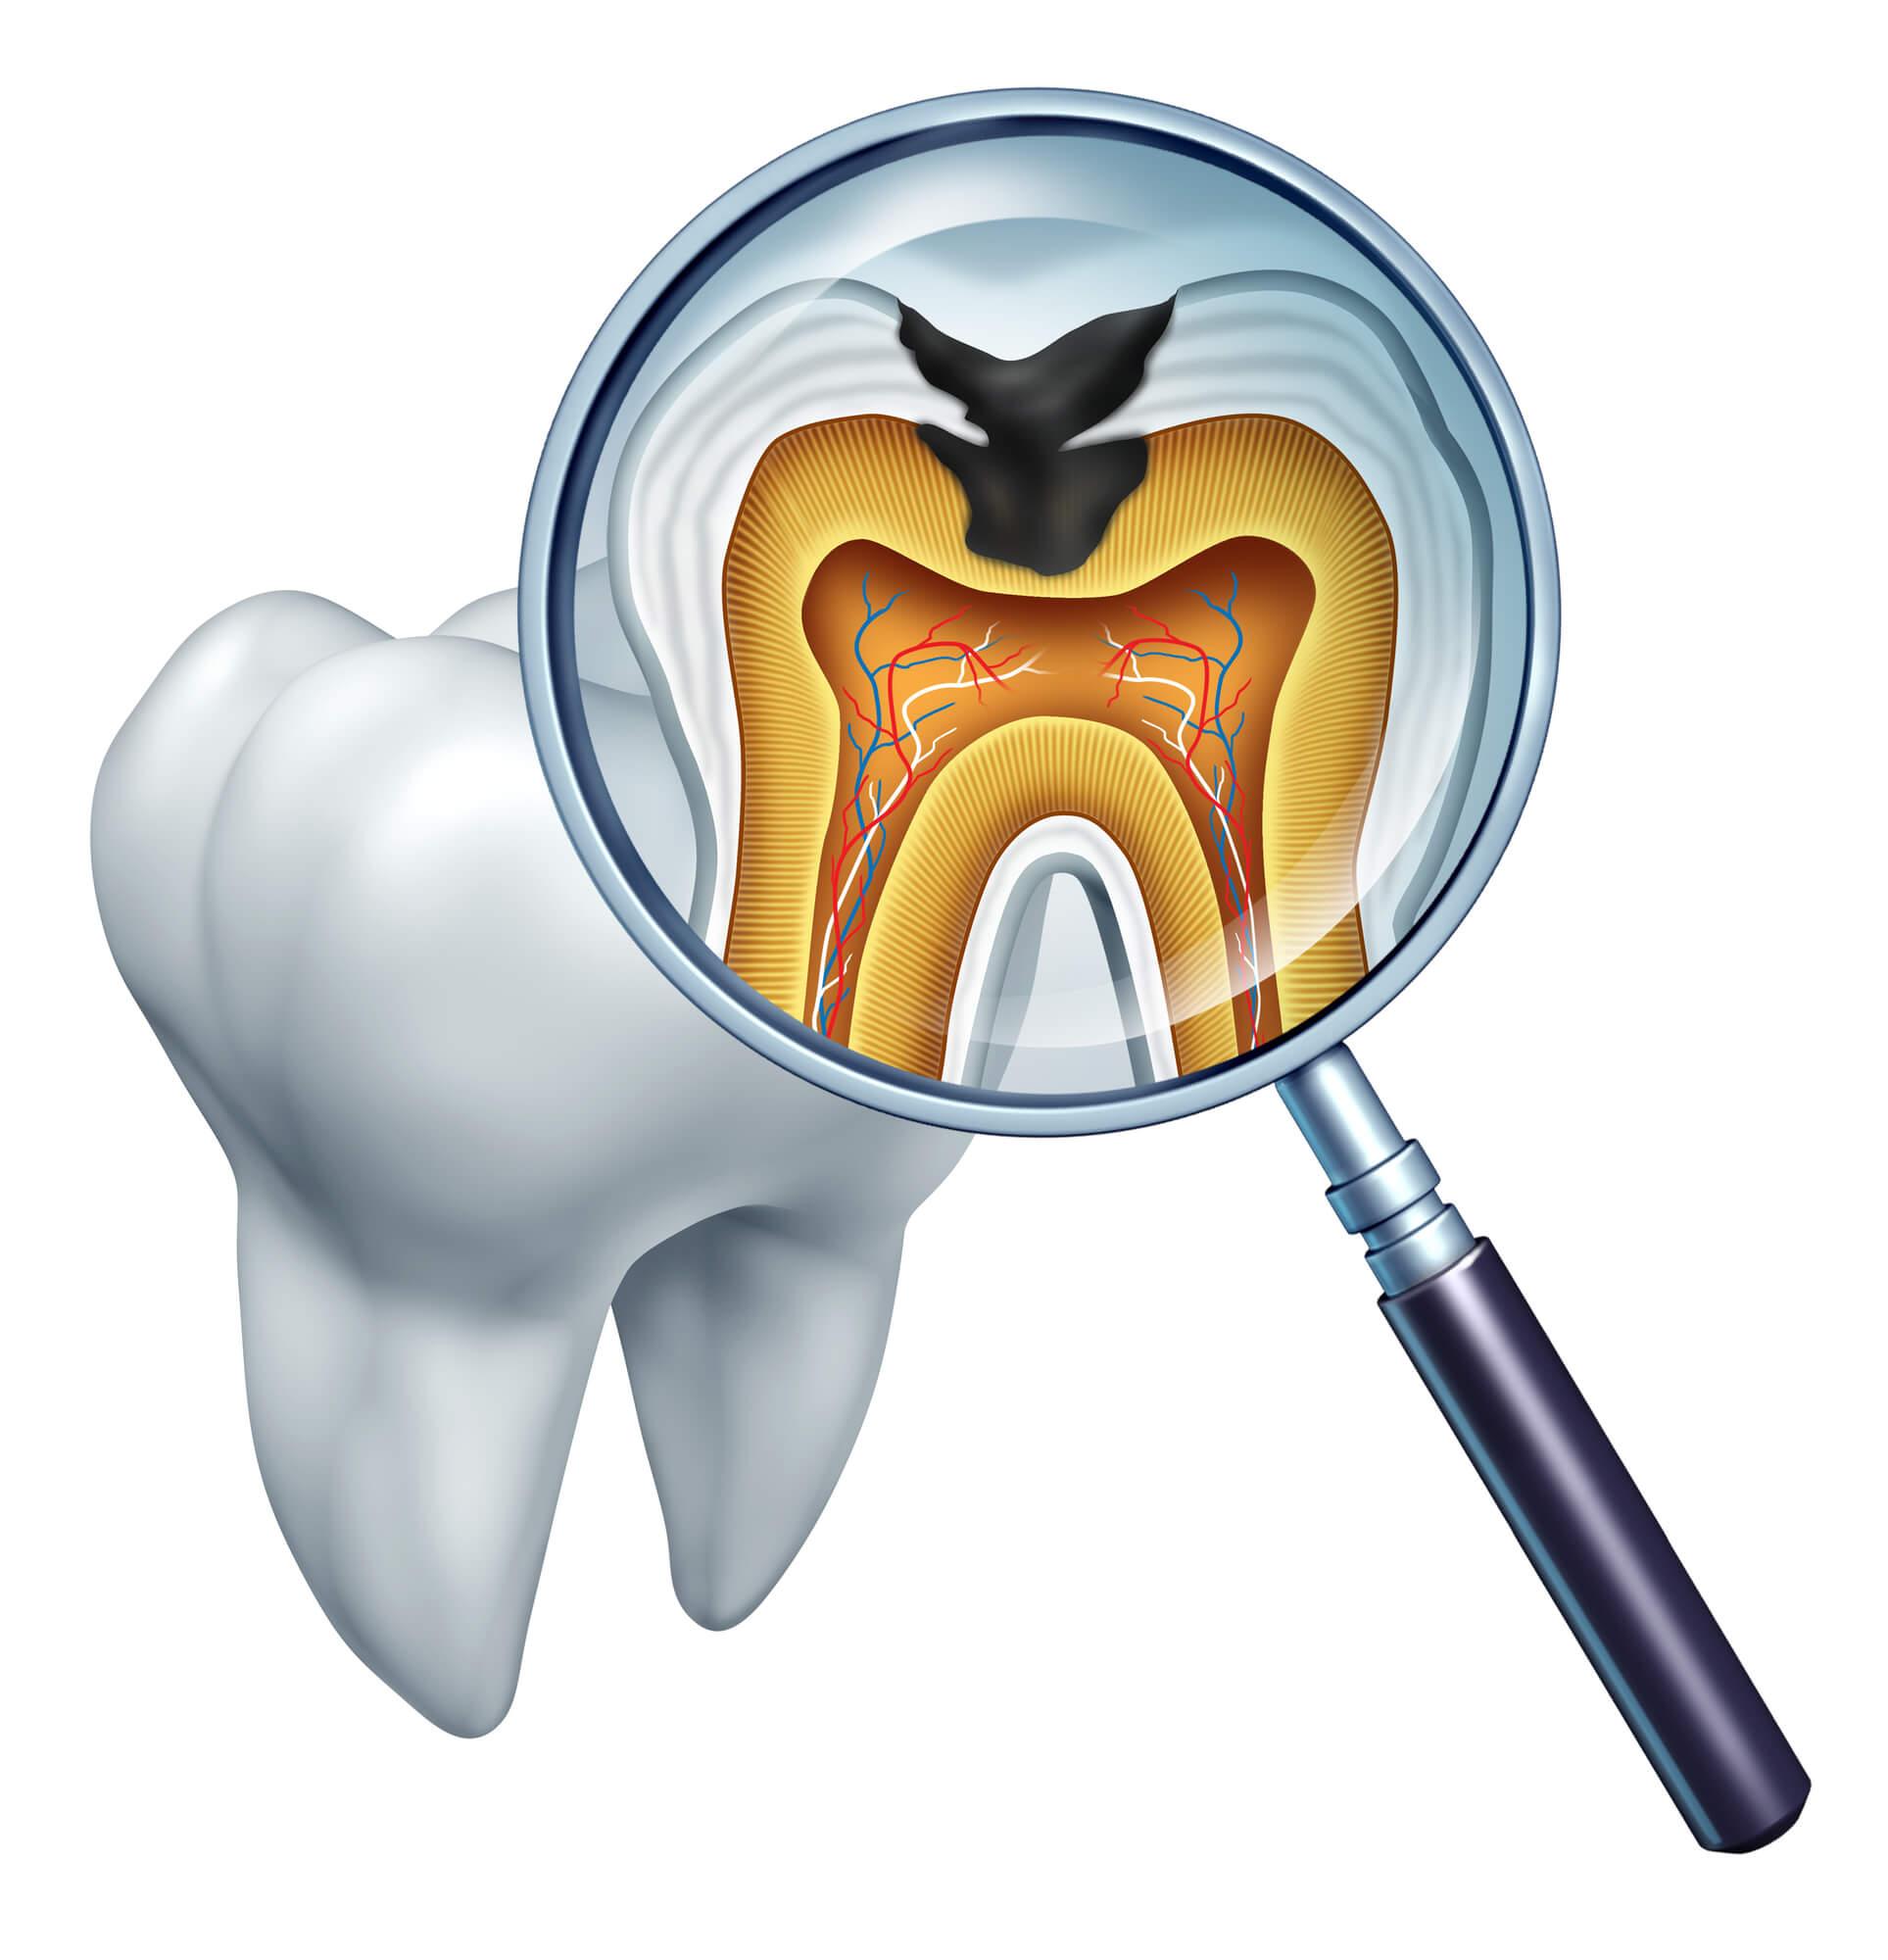 Do You Need an Endodontist 23226?